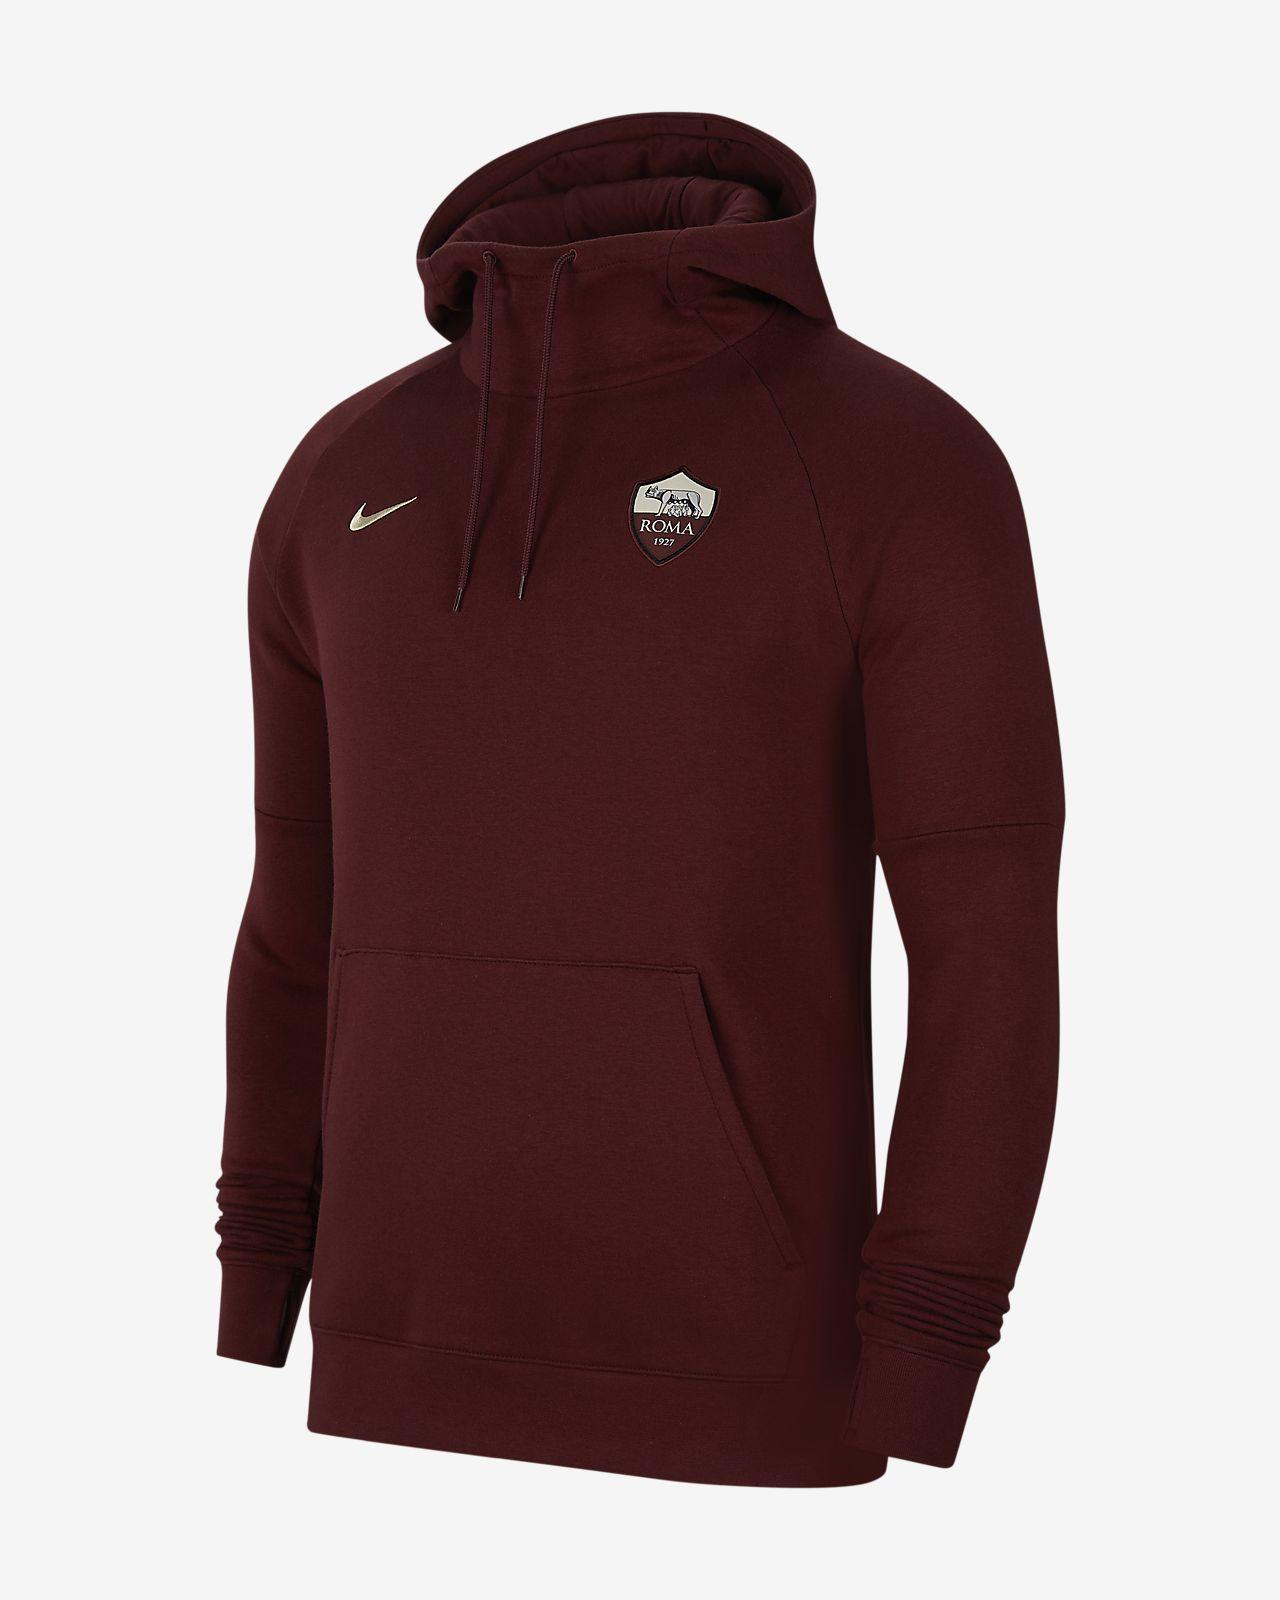 A.S. Roma Men's Fleece Pullover Hoodie